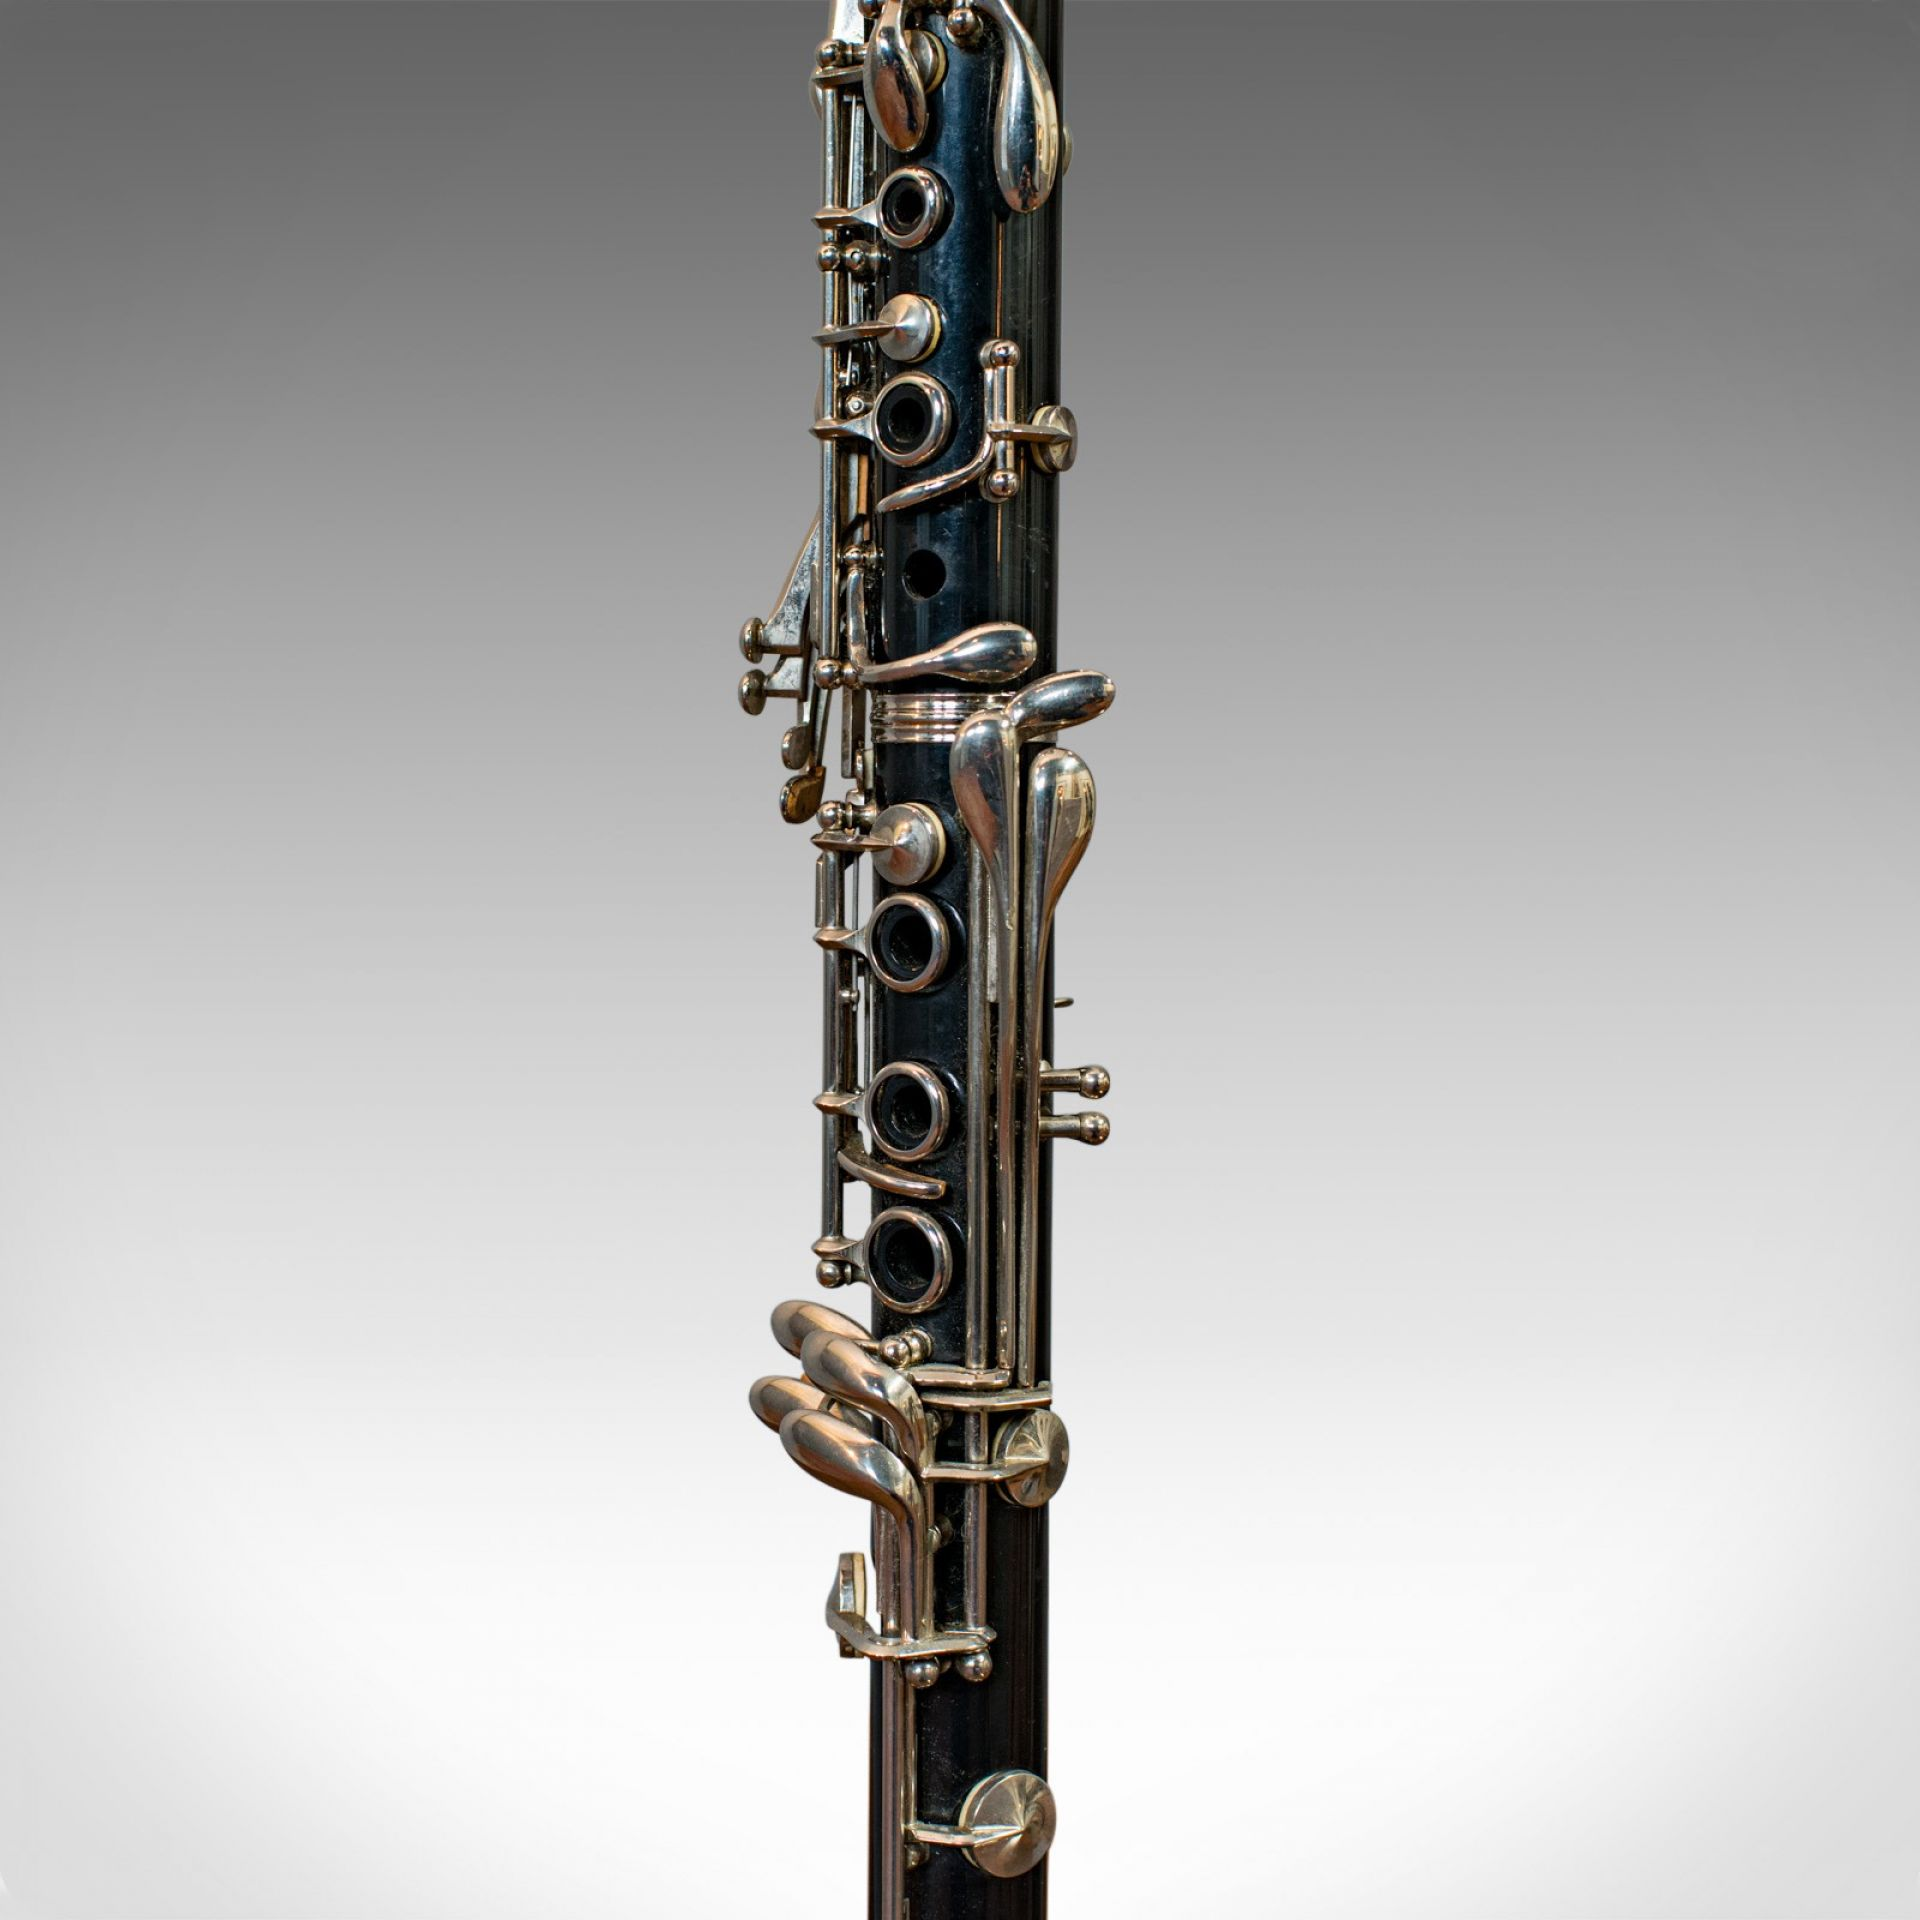 Vintage Clarinet Lamp, Bespoke, Handmade, Table, Light, Crafted, Instrument